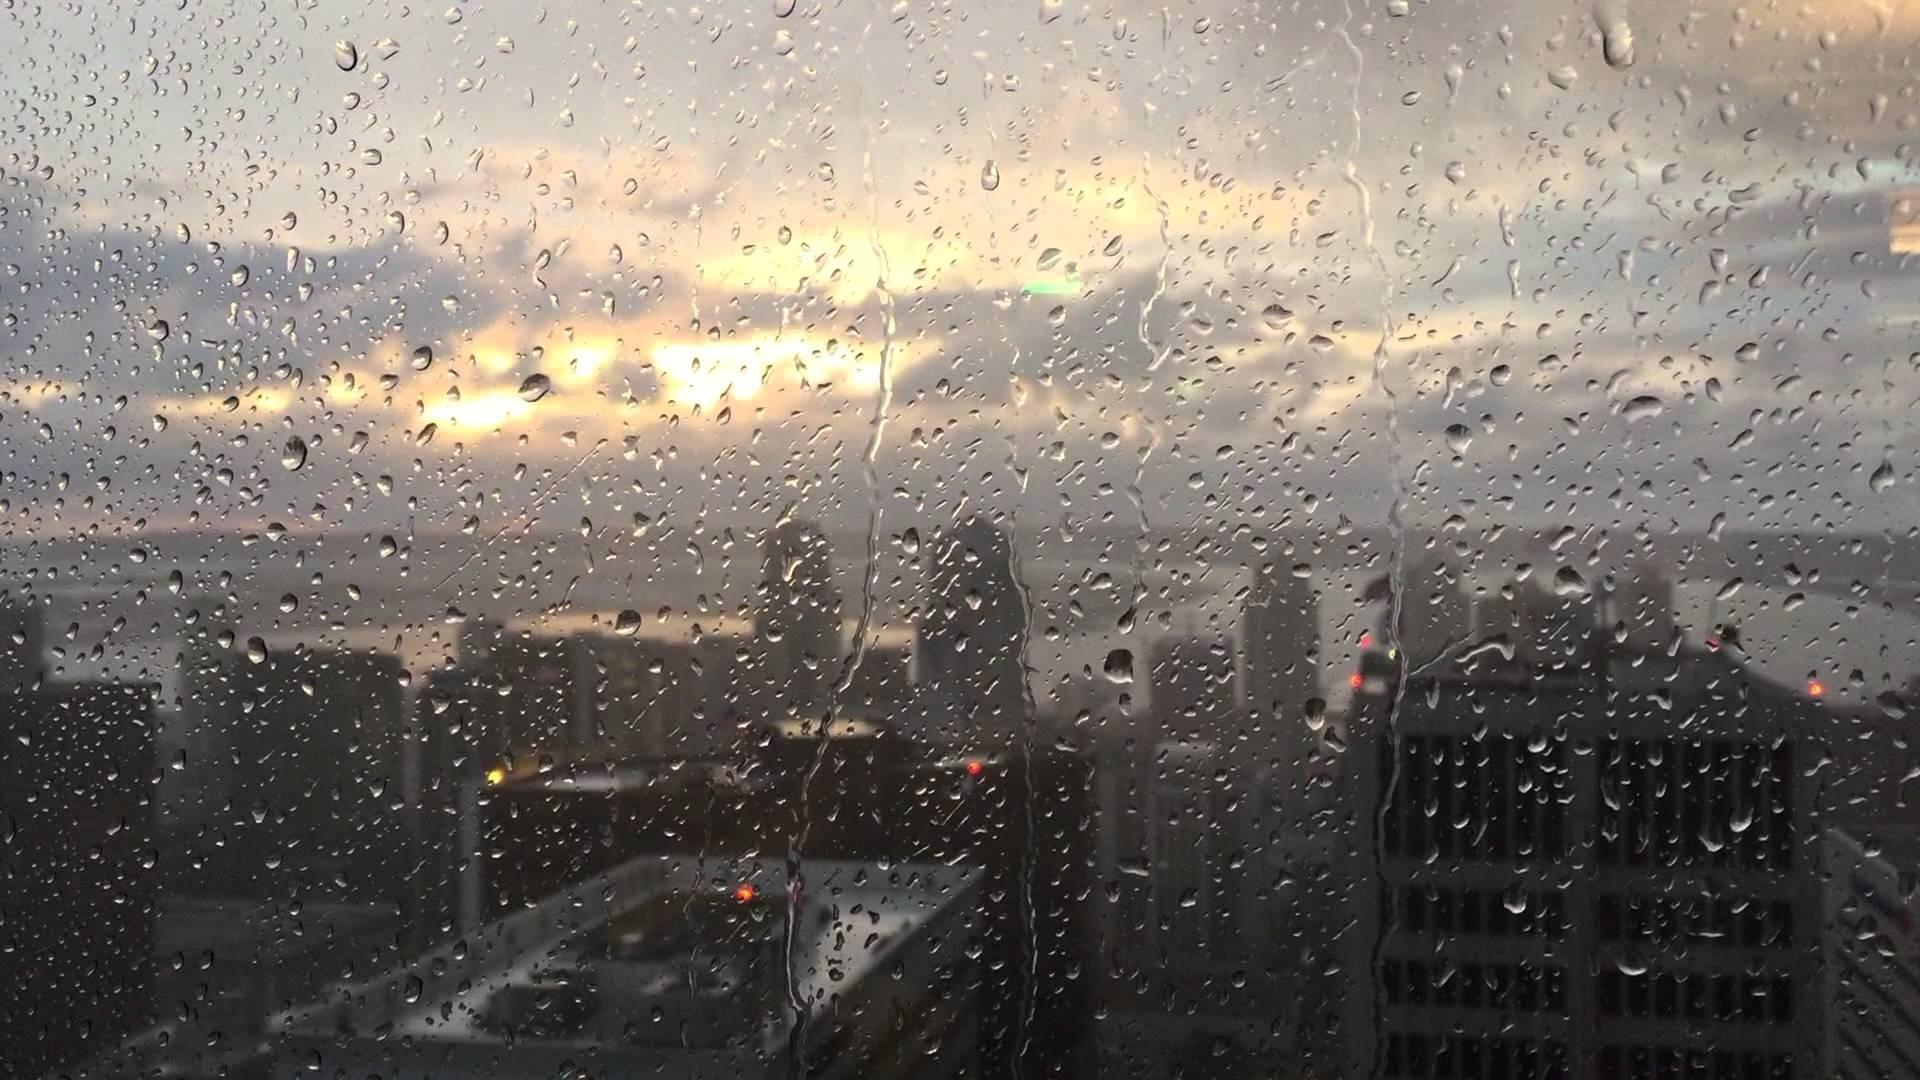 video background rain window - youtube